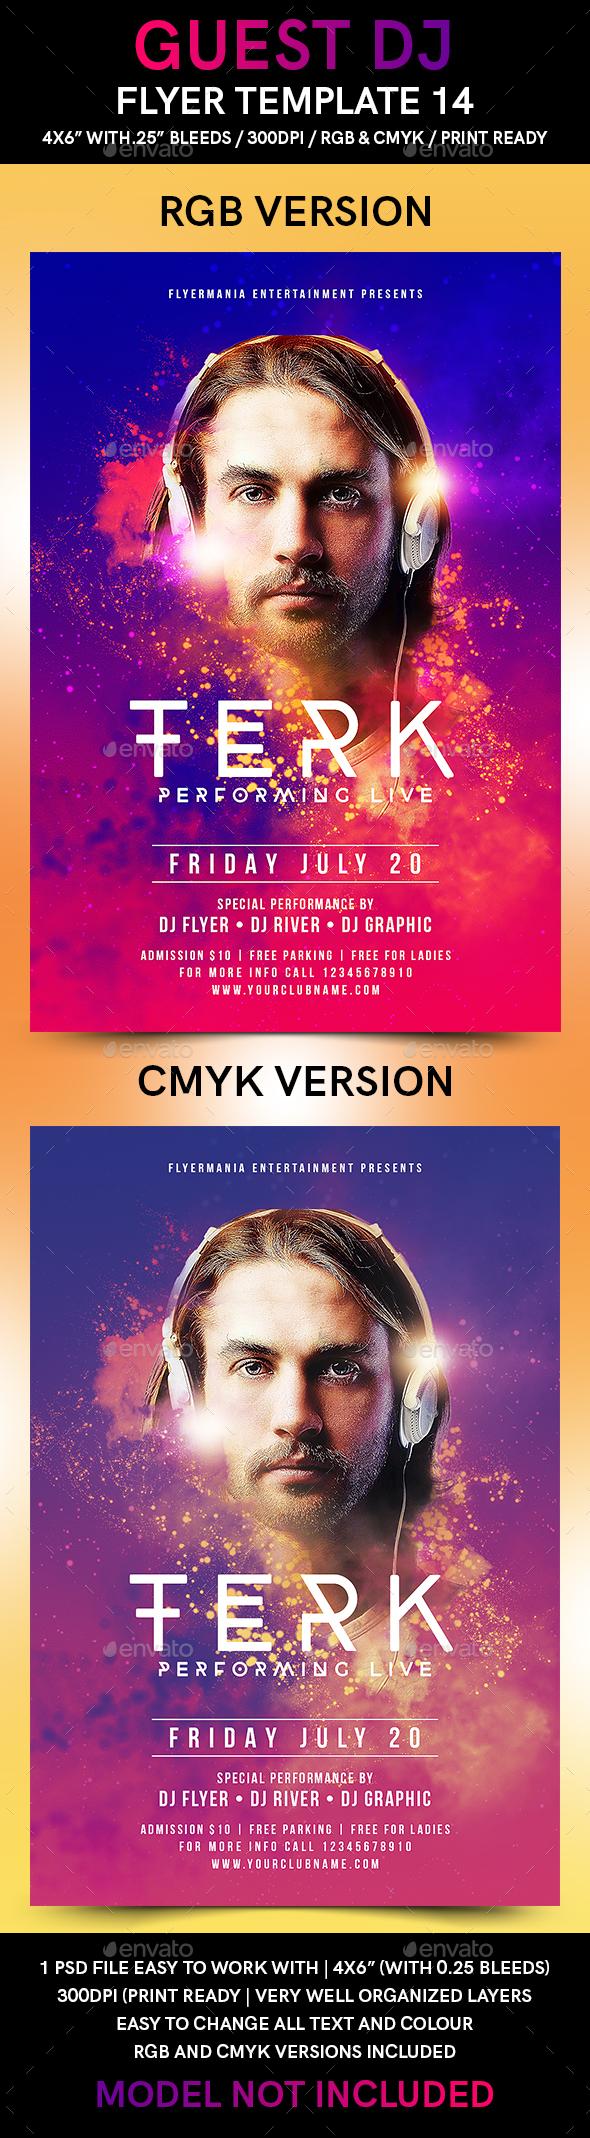 Guest DJ Flyer Template 14 - Flyers Print Templates